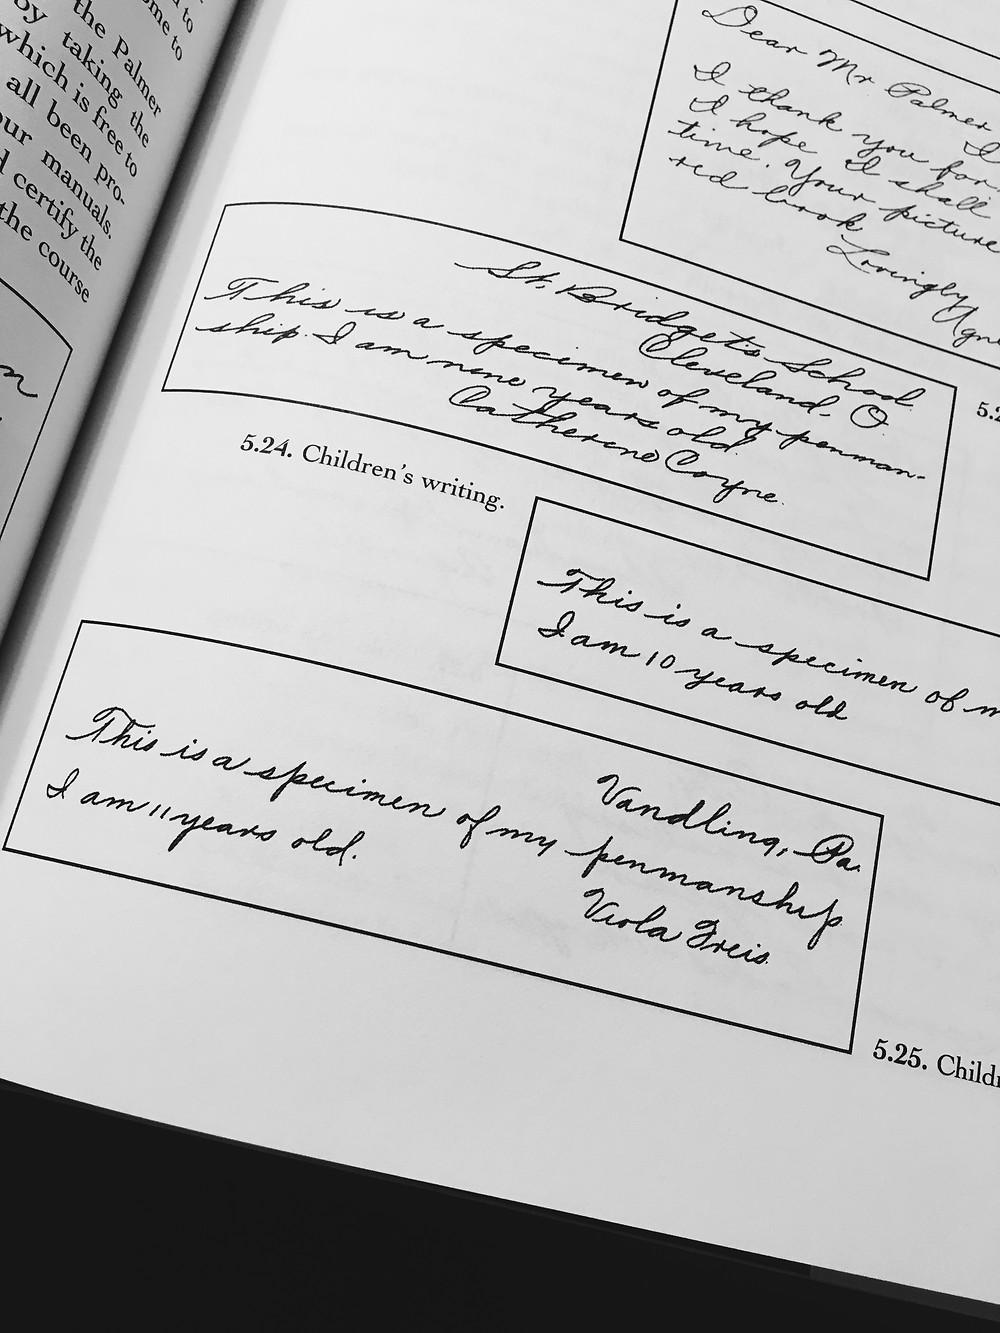 Excerpt of Children's handwriting from An Elegant Hand